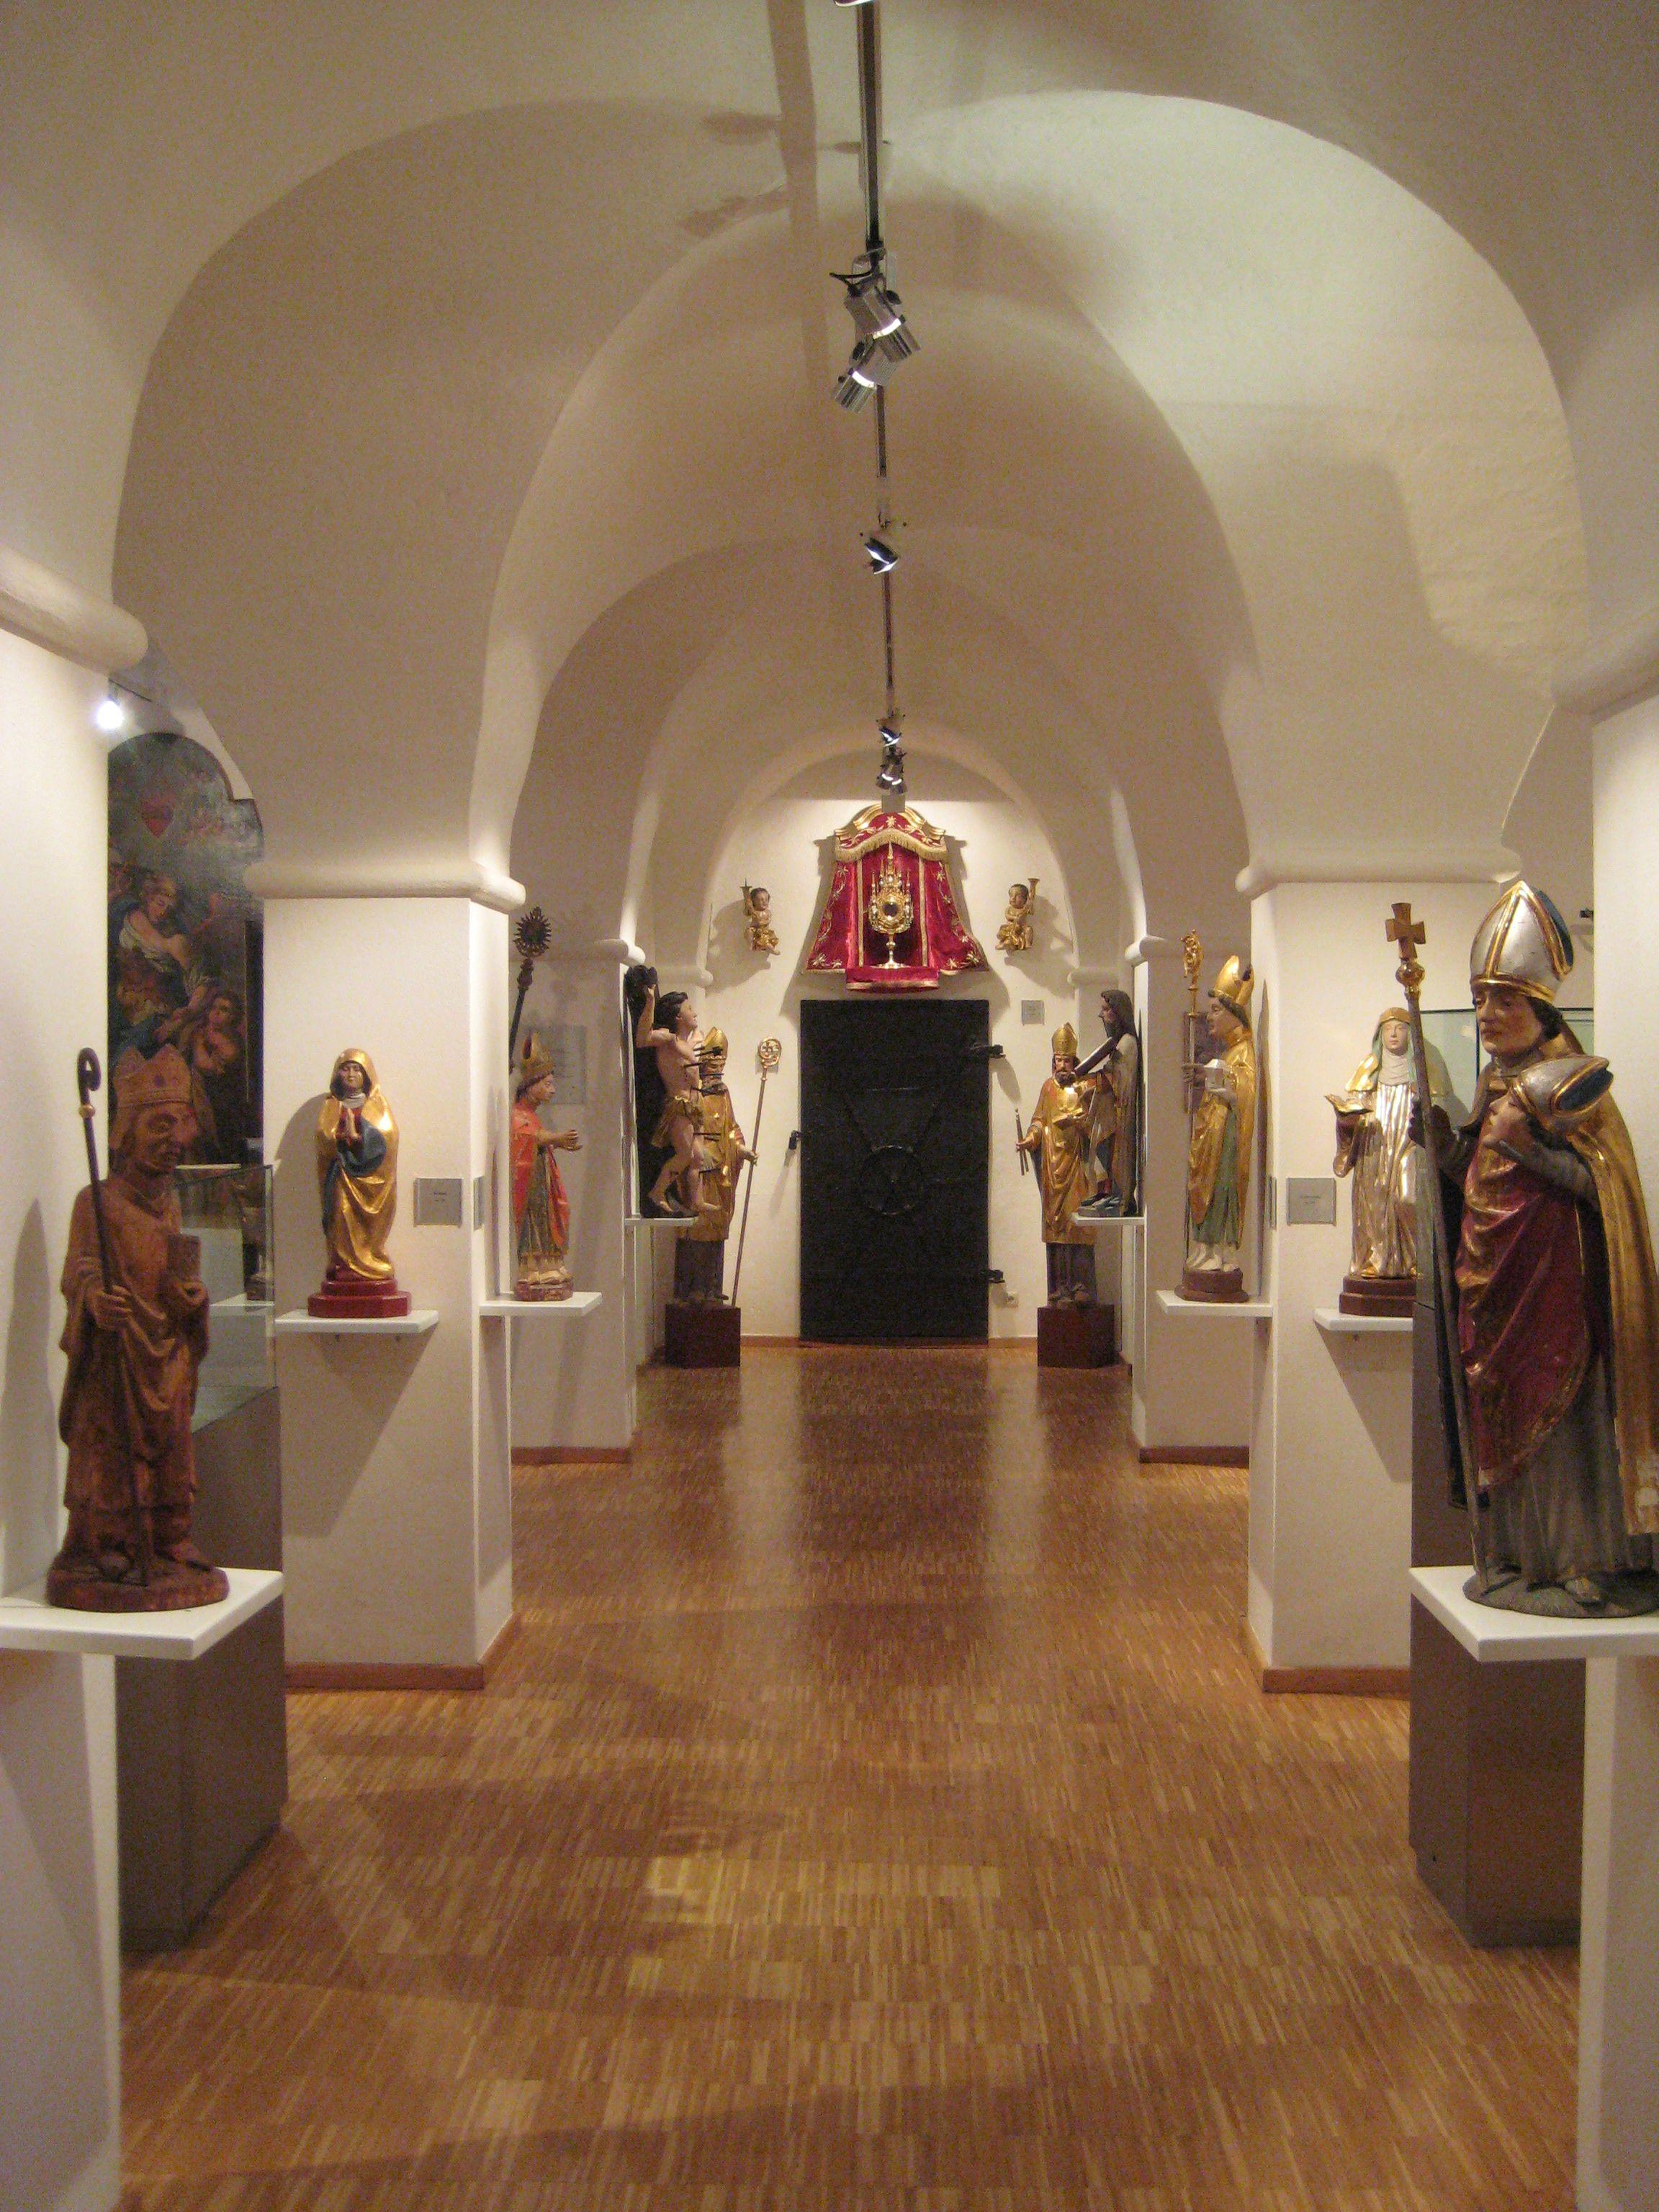 pfarr--und-wallfahrtsmuseum-mariapfarr_f